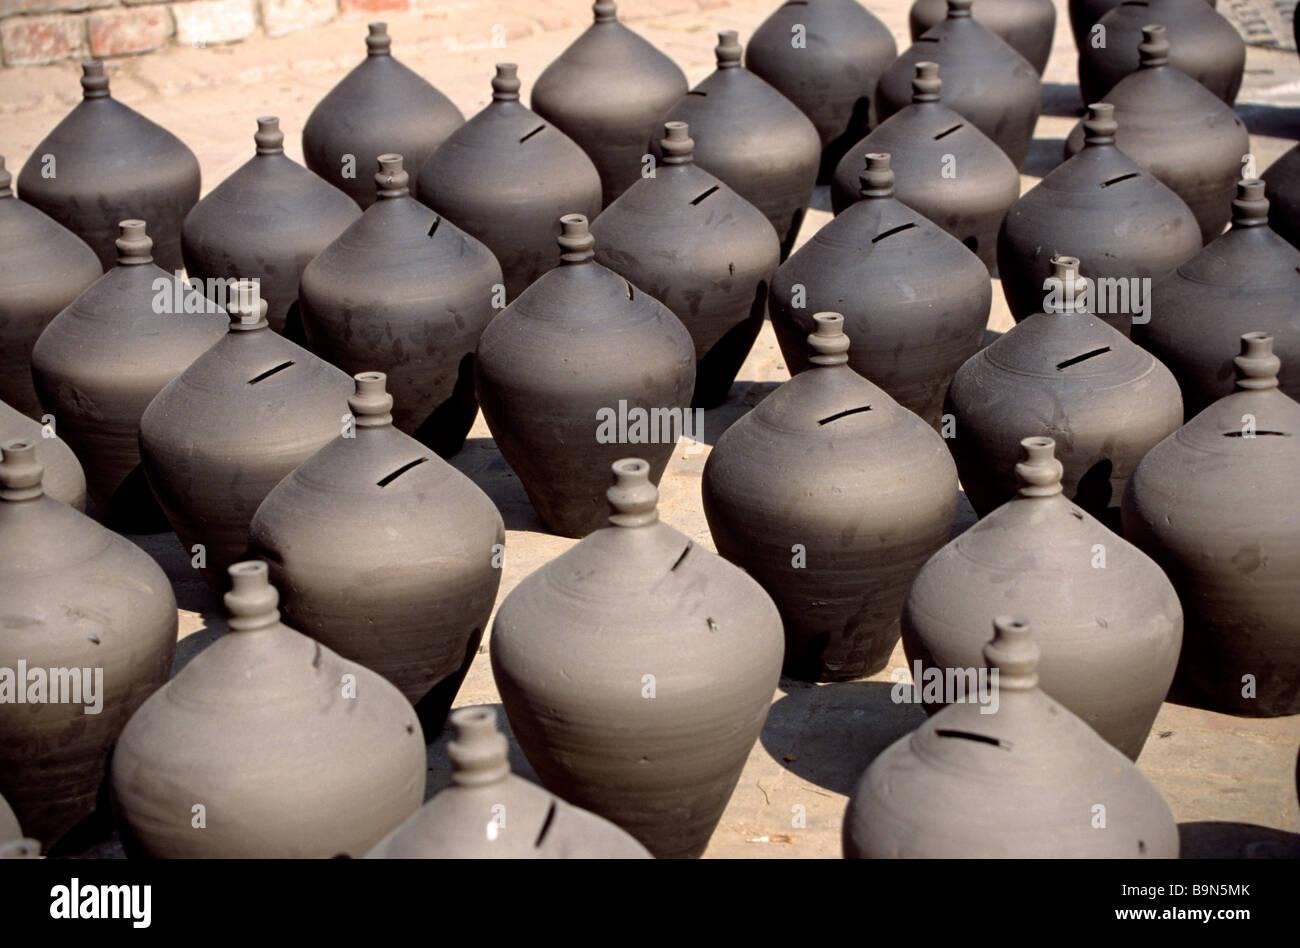 Nepal, Kathmandu Valley, Bhaktapur, earthenware banks drying in the sun - Stock Image